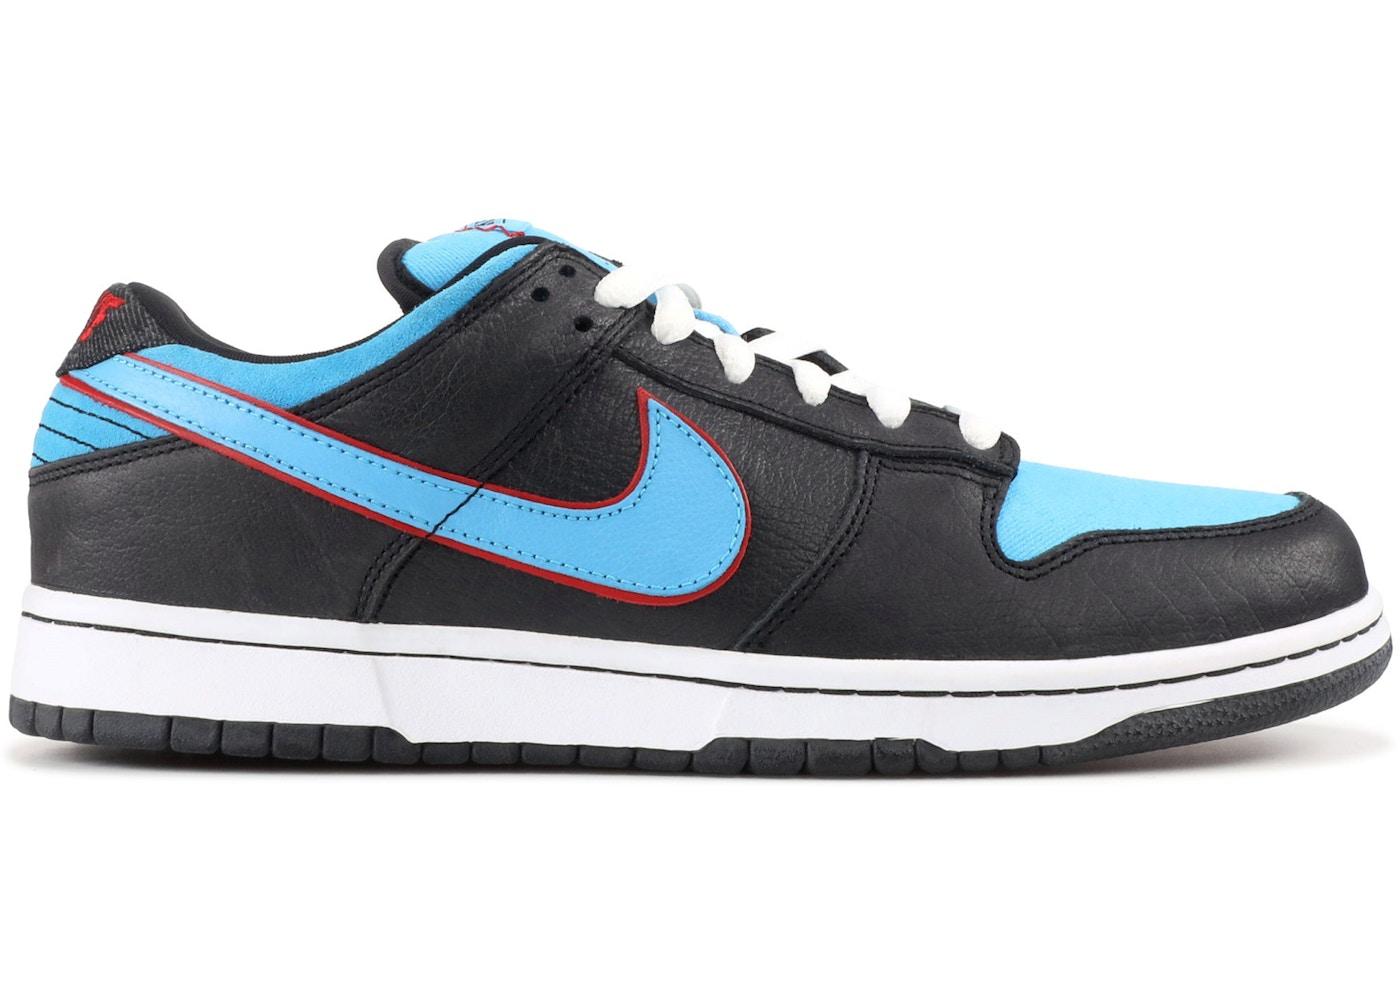 784e90e4 Nike SB Dunk Low Angel and Death - 313170-041